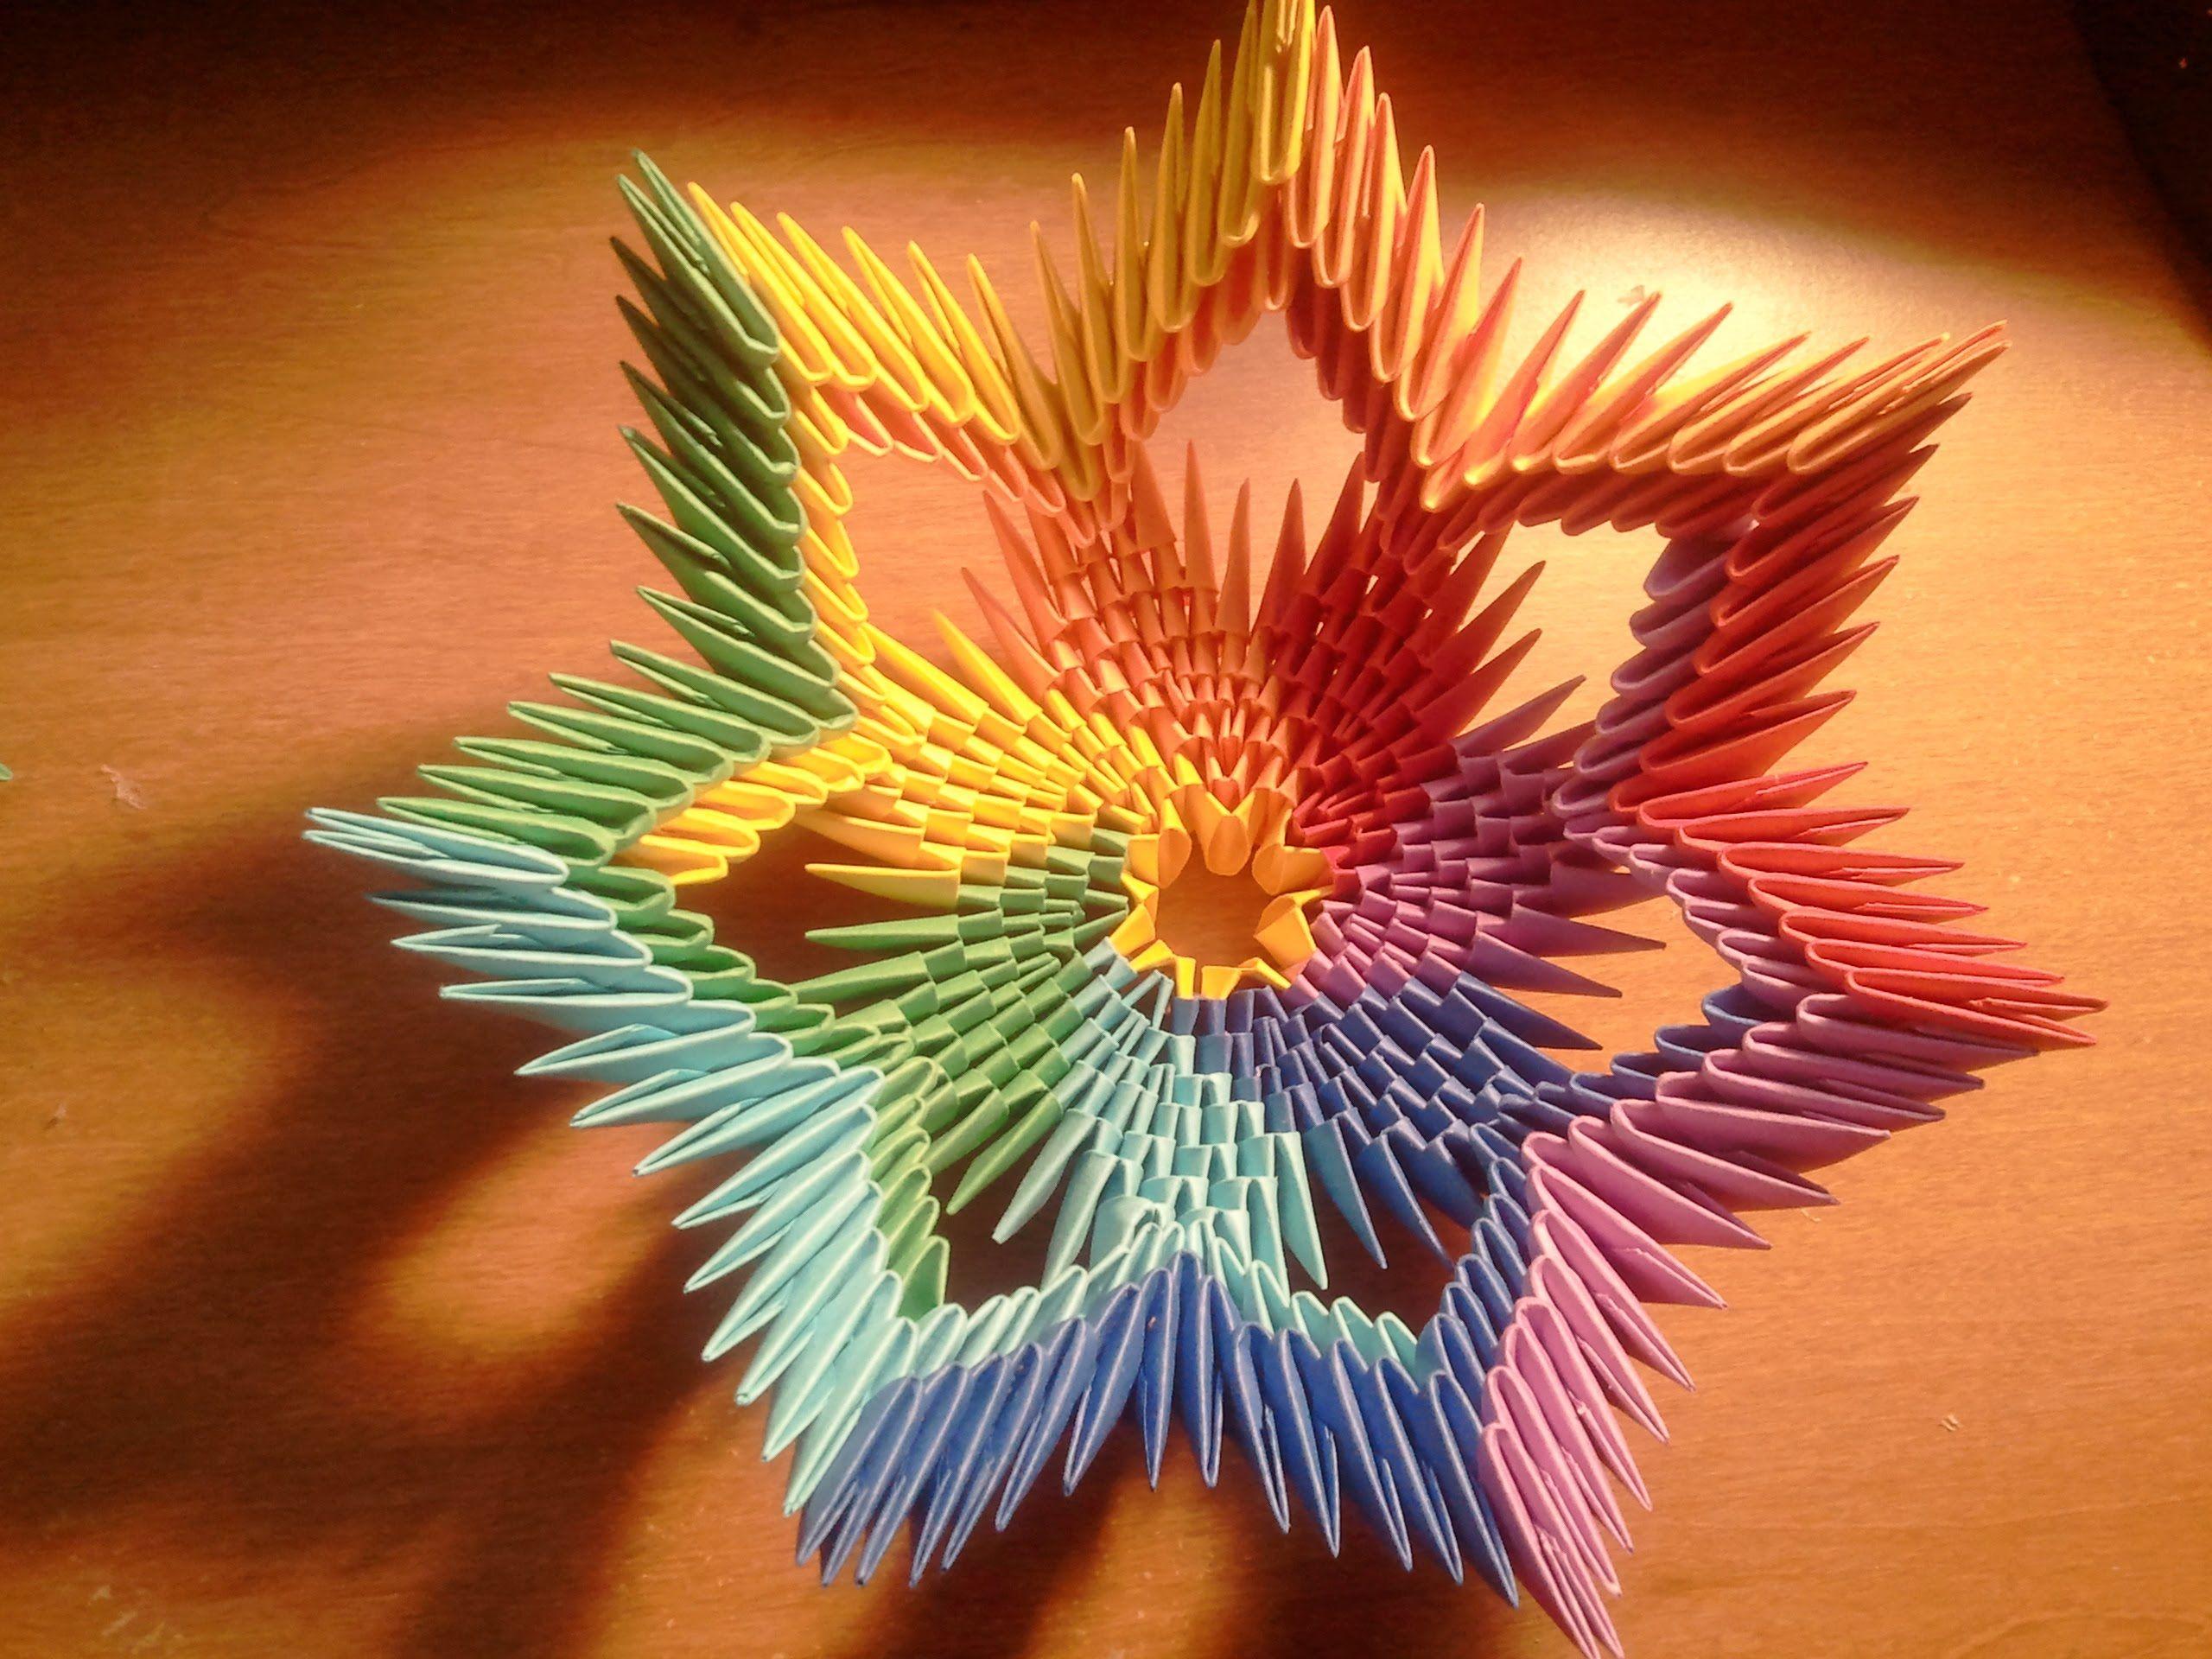 How to make 3d origami rainbow vase bowl origami pinterest how to make 3d origami rainbow vase bowl mightylinksfo